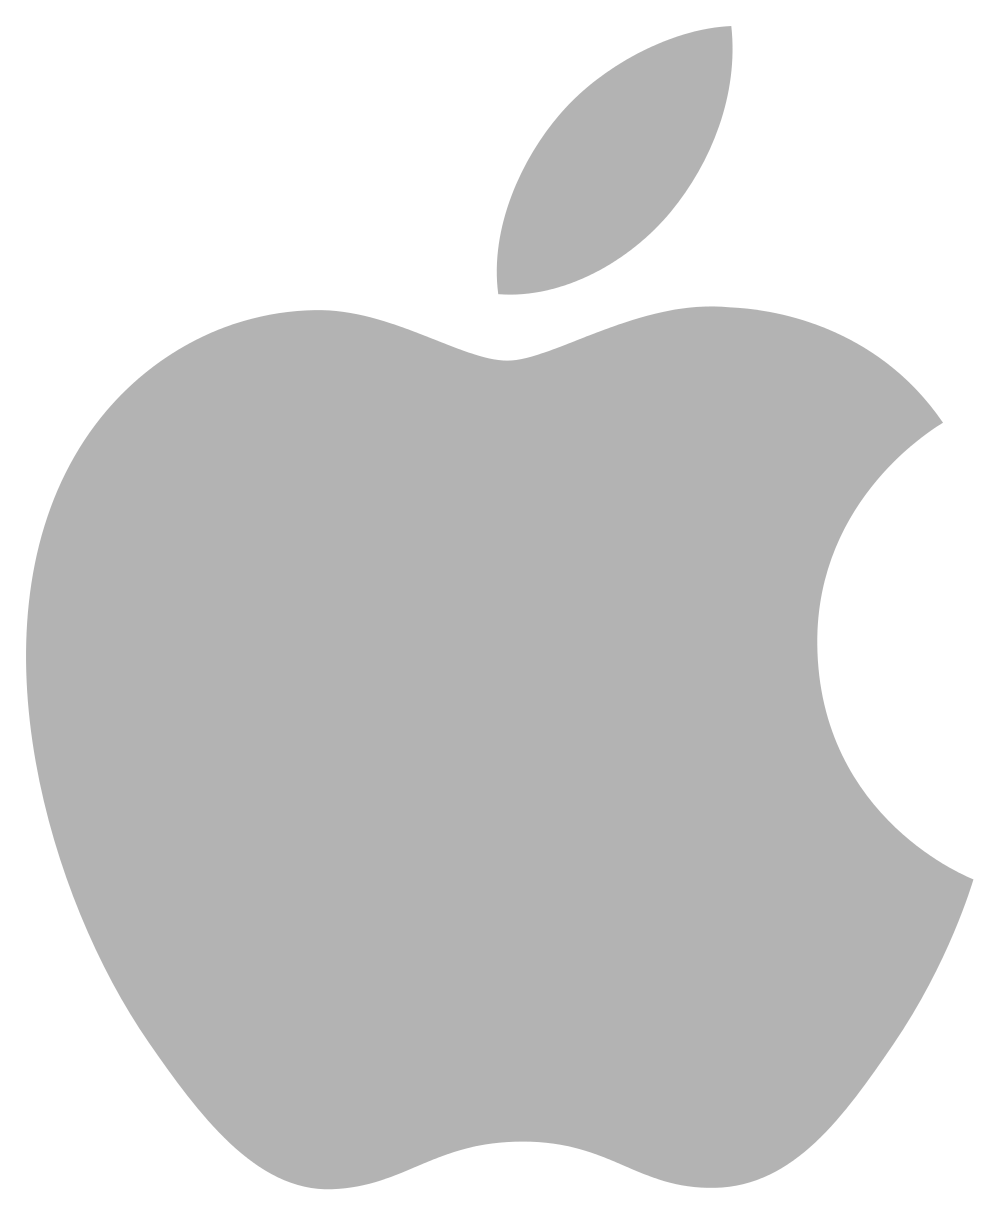 Apple Logo Png White noise, Apple logo, Iphone background